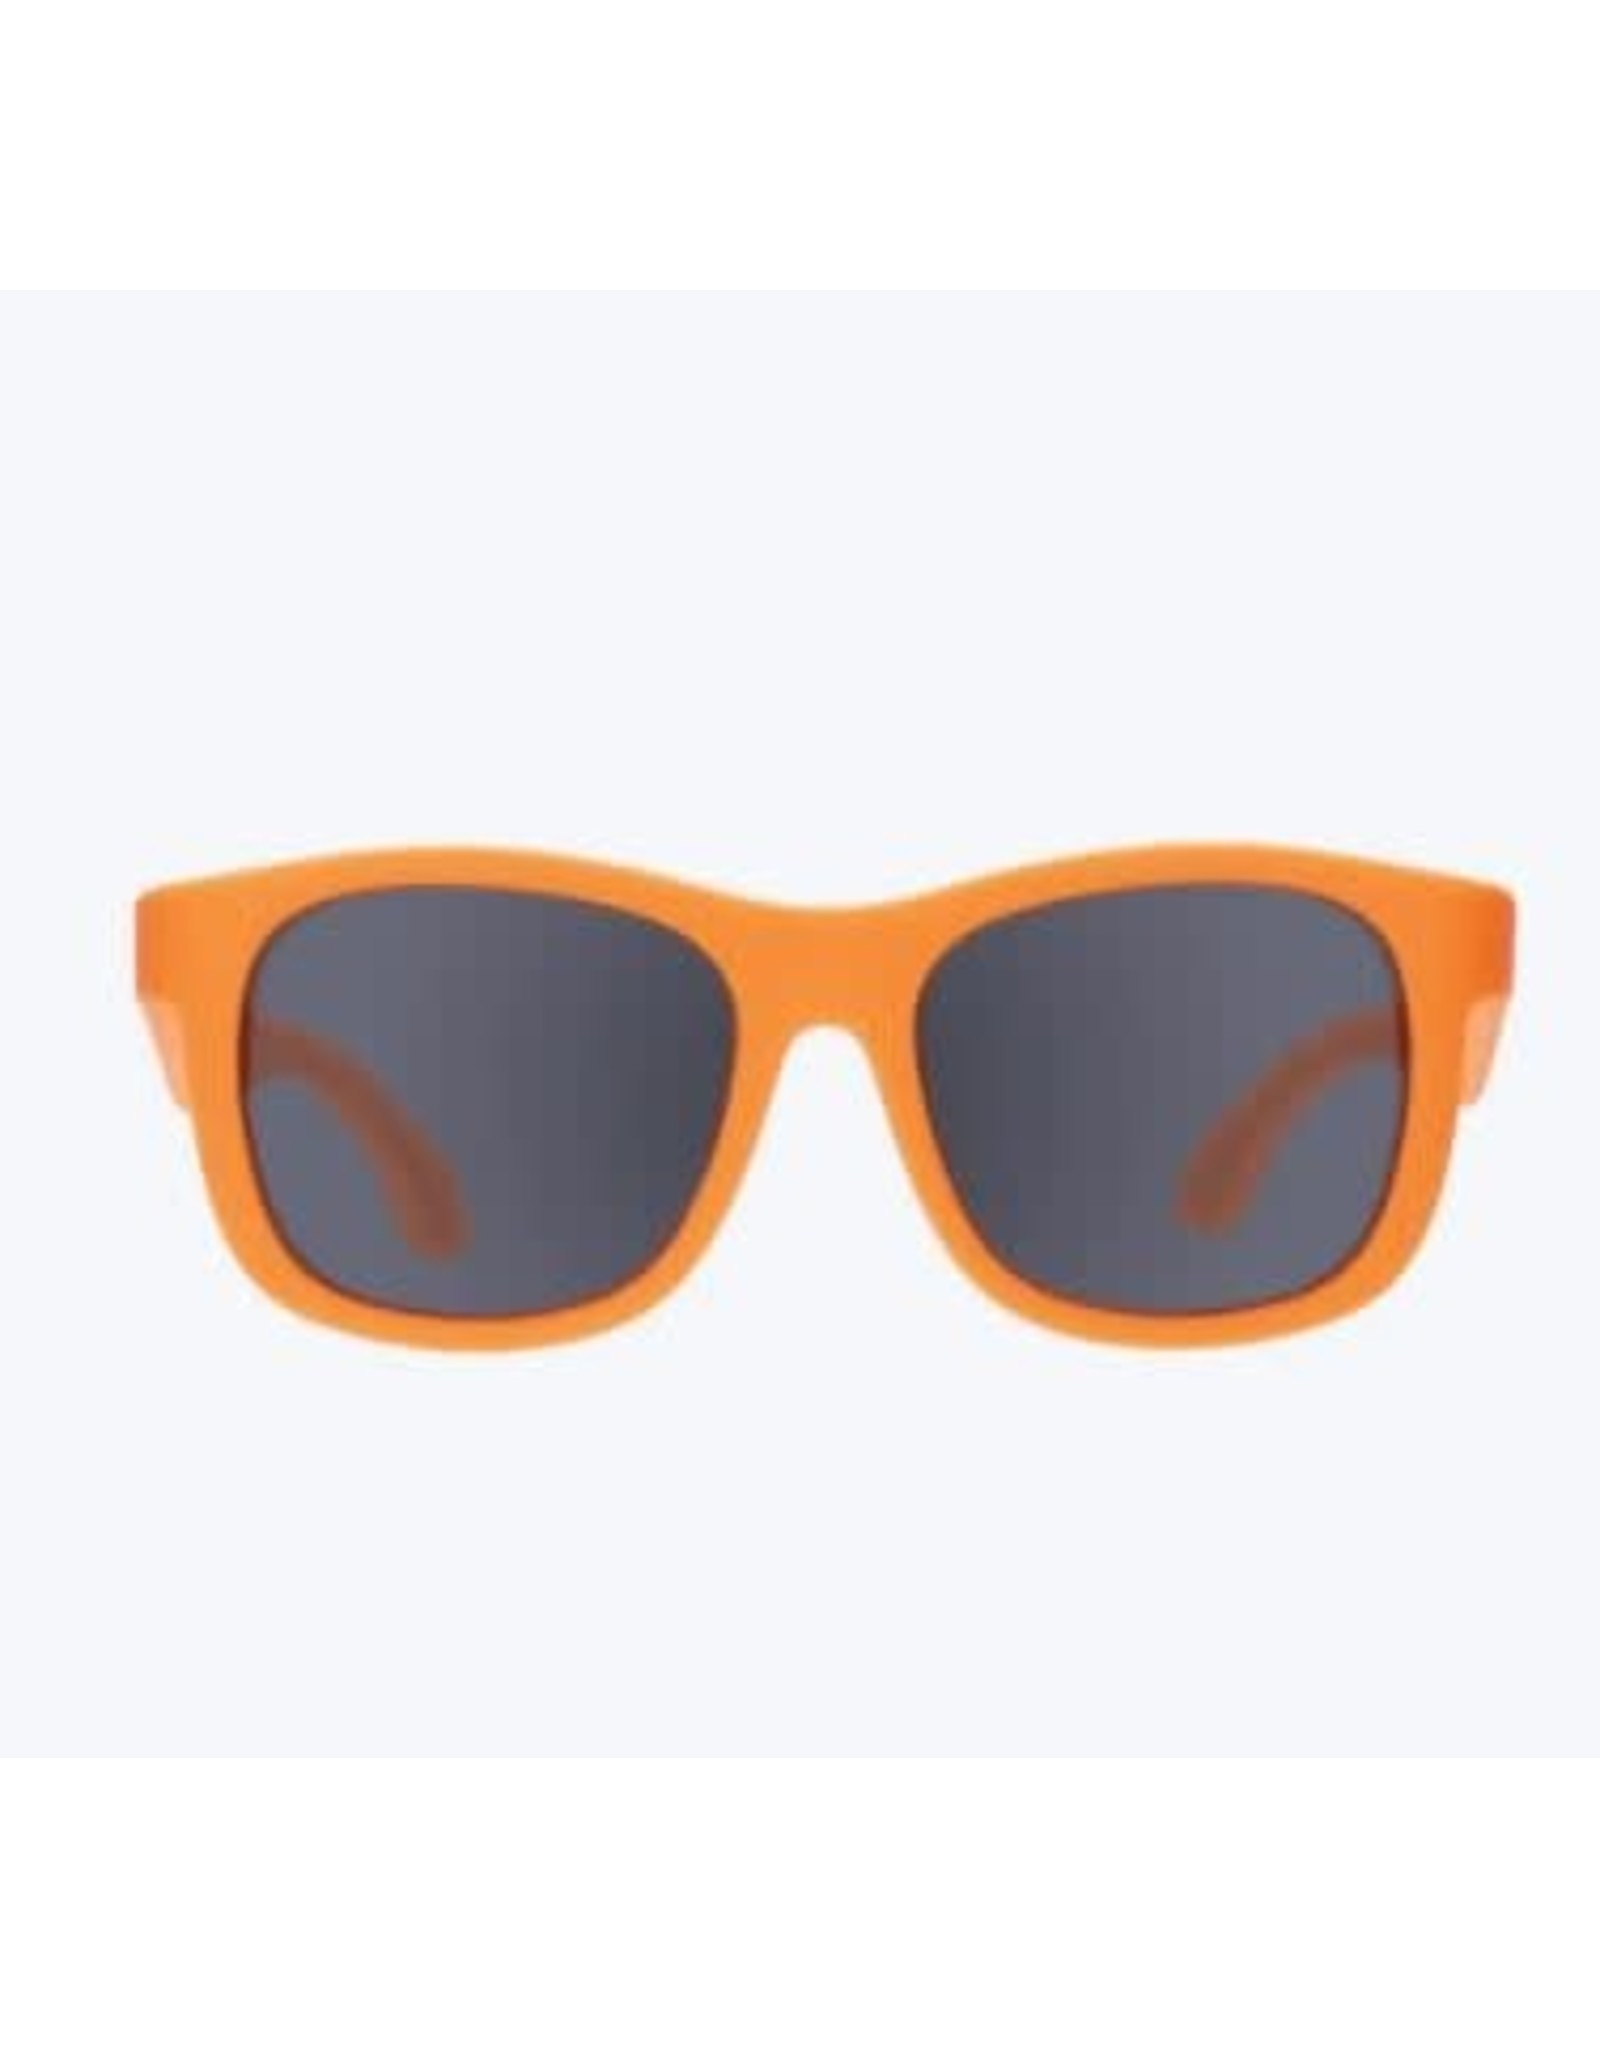 "Babiators ""Orange Crush"" Sunglasses"